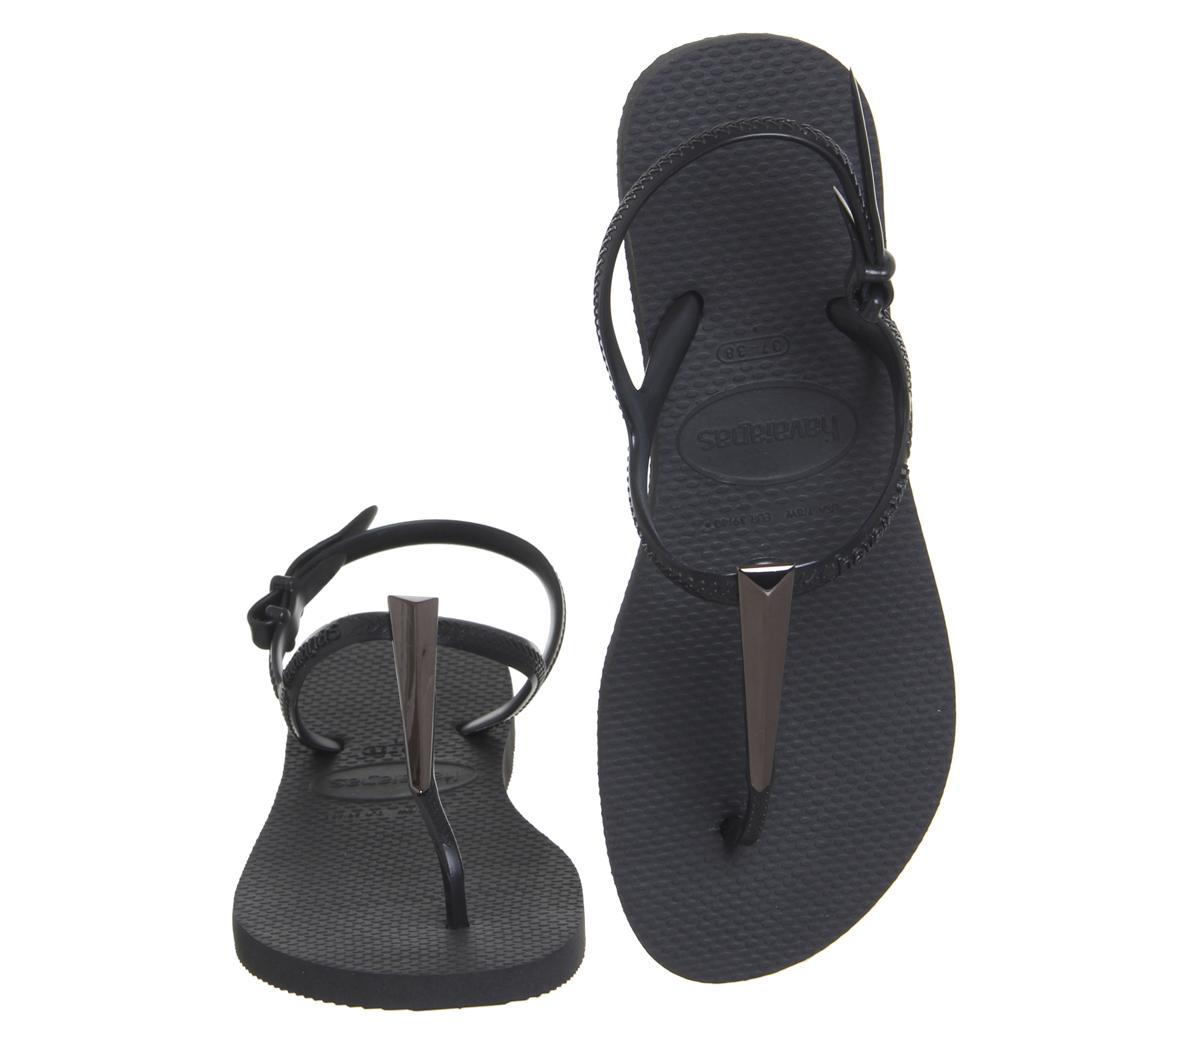 d90c34639f7 Womens-Havaianas-Freedom-Sl-Maxi-Black-Sandals thumbnail 8